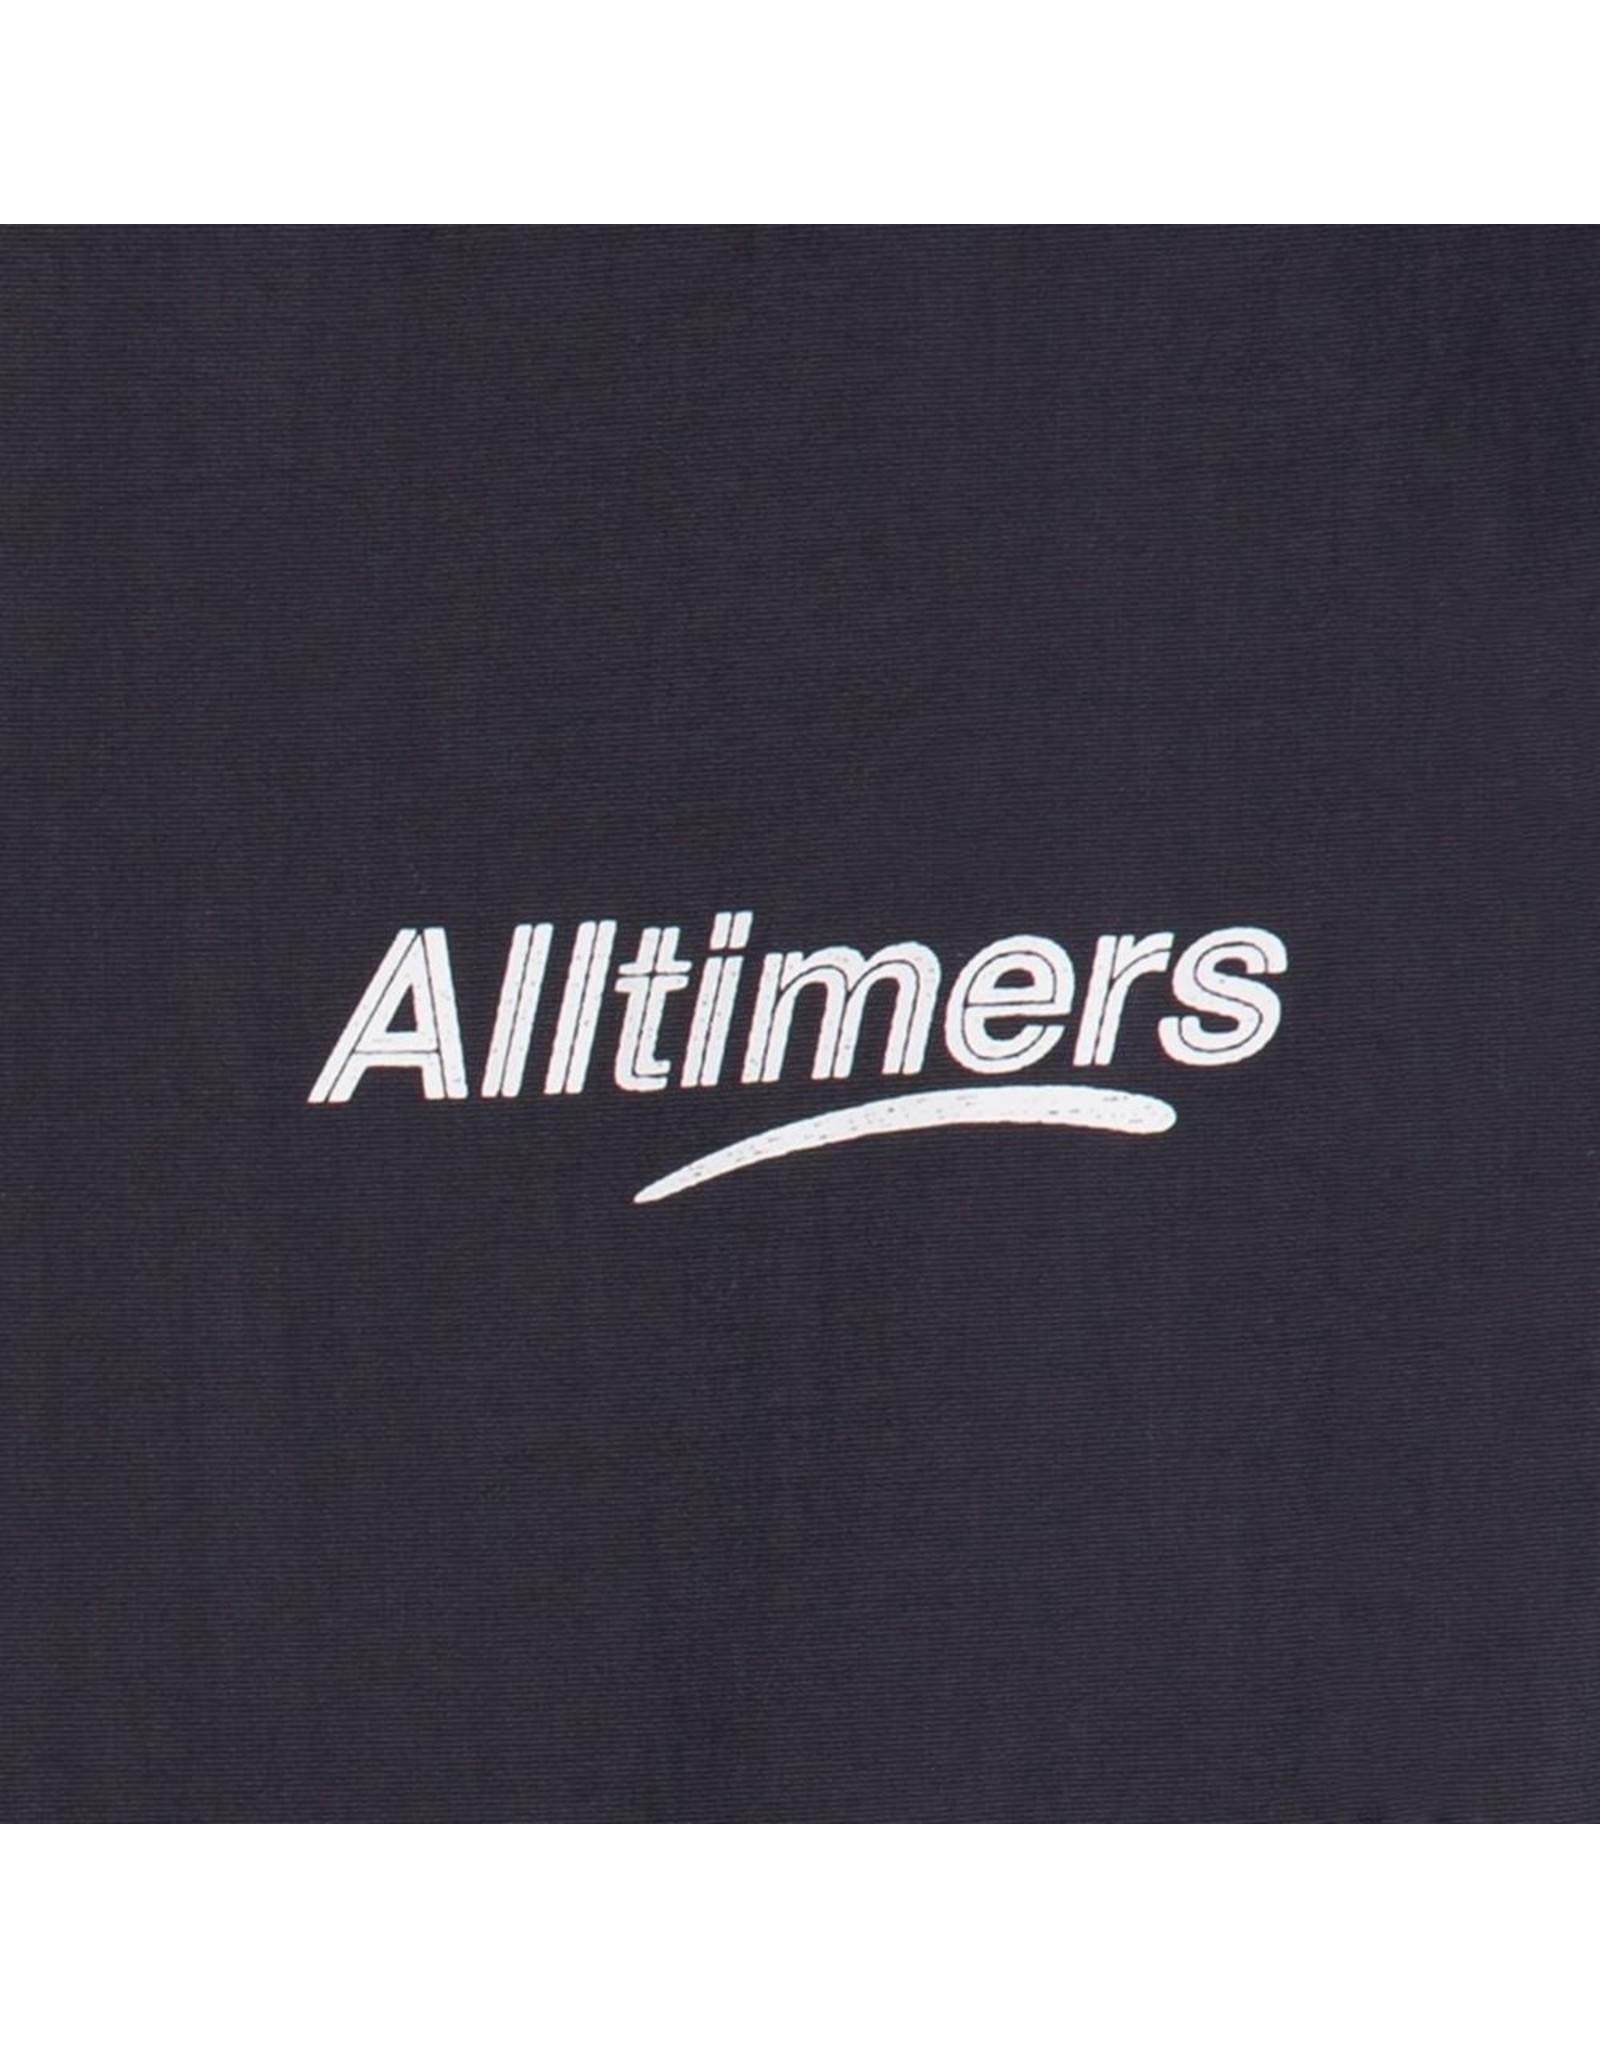 ALLTIMERS ALLTIMERS - QUICK FAST TRACK PANT - BLACK/BLUE